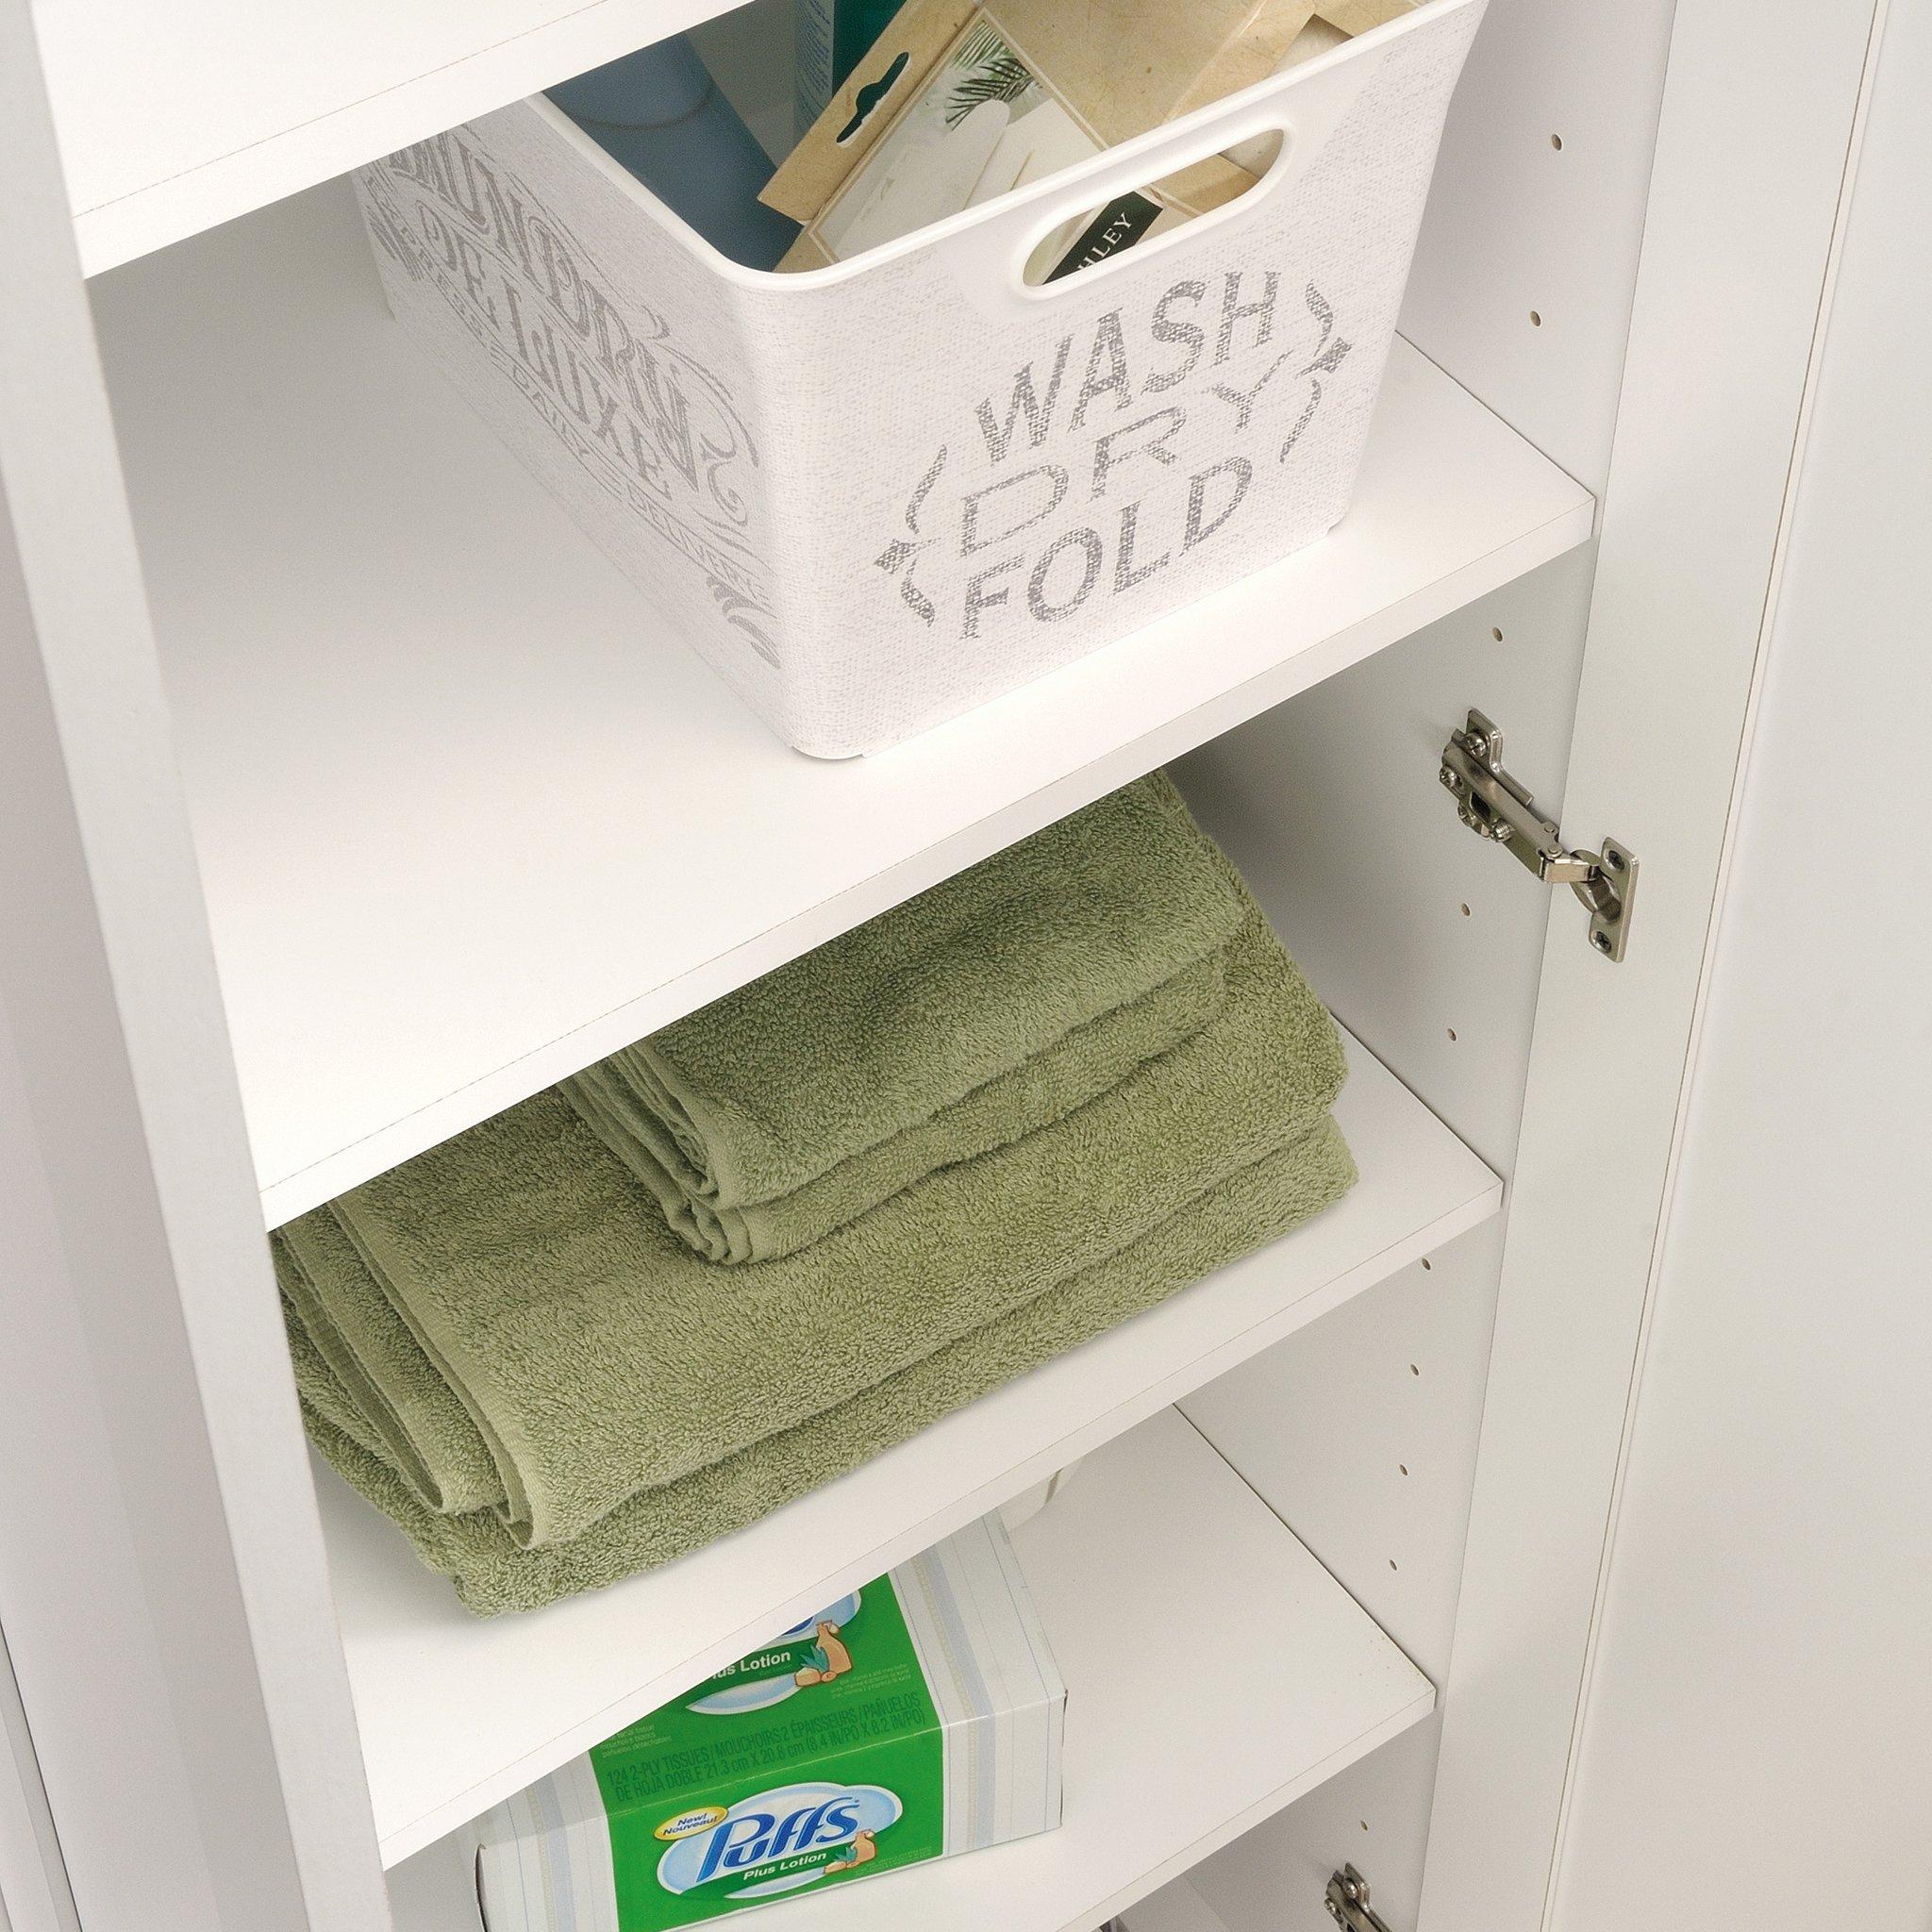 Sauder 422425 HomePlus Storage Cabinet, L: 23.31″ x W: 17.01″ x H: 70.91″, Soft White finish